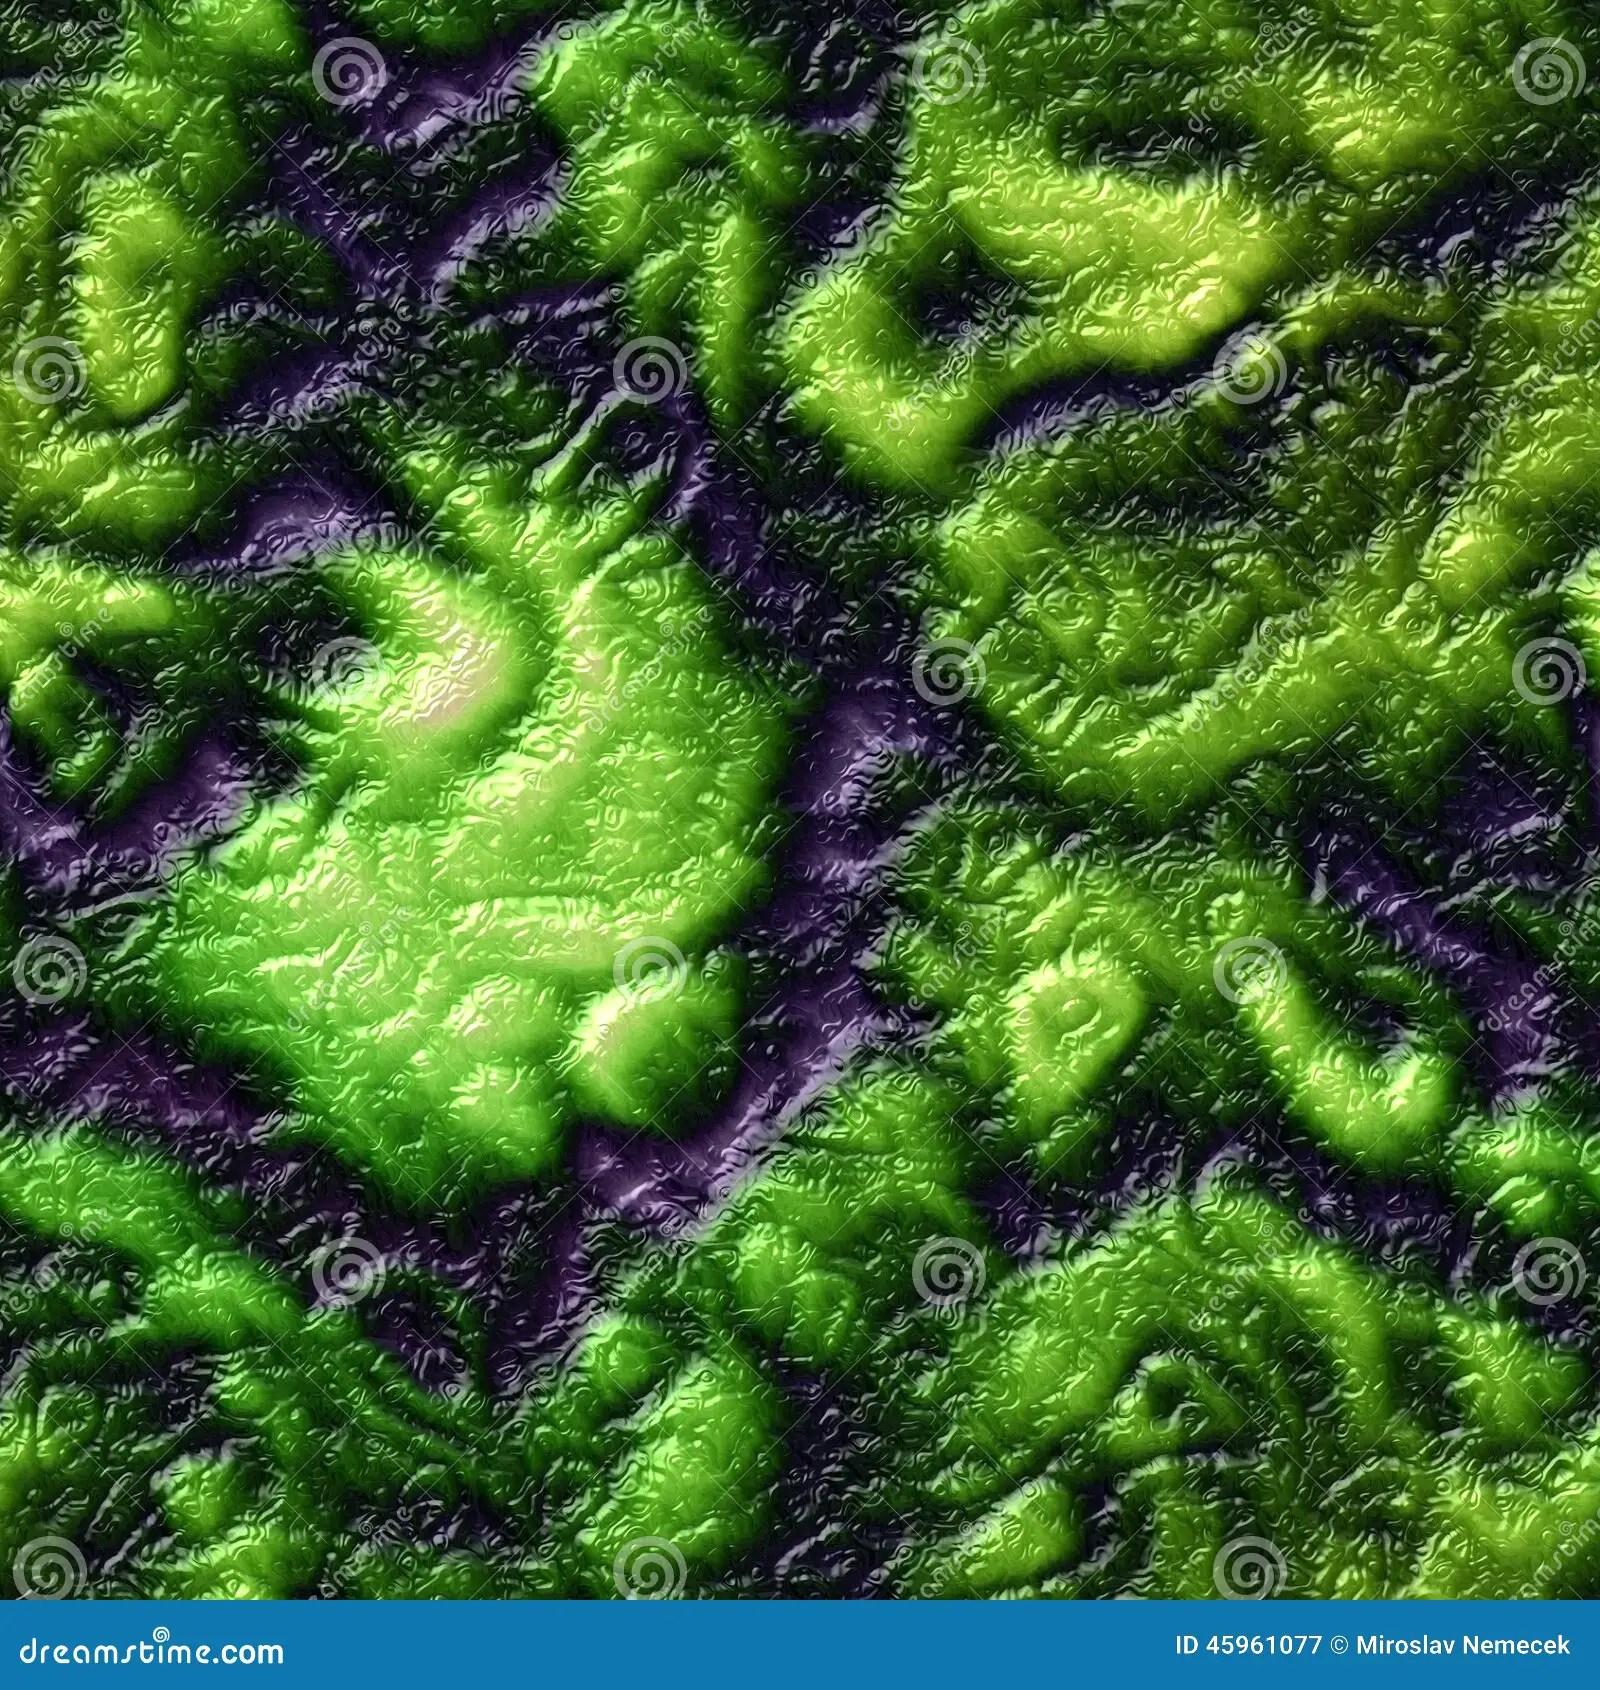 Green Animal Print Wallpaper Alien Skin Organic Seamless Generated Hires Texture Stock